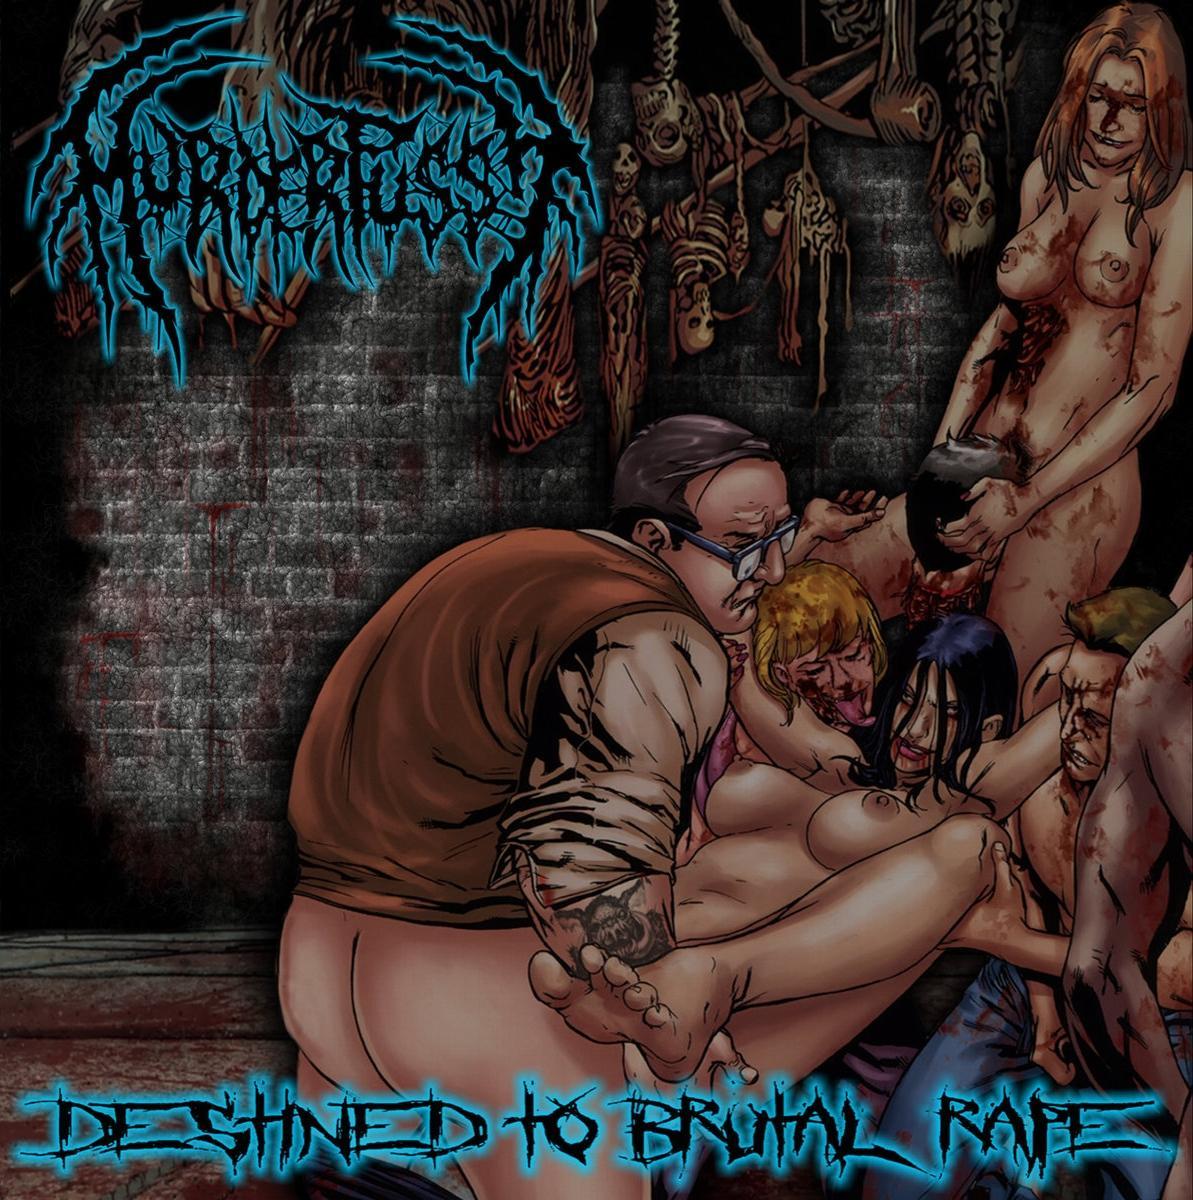 deathcore porn